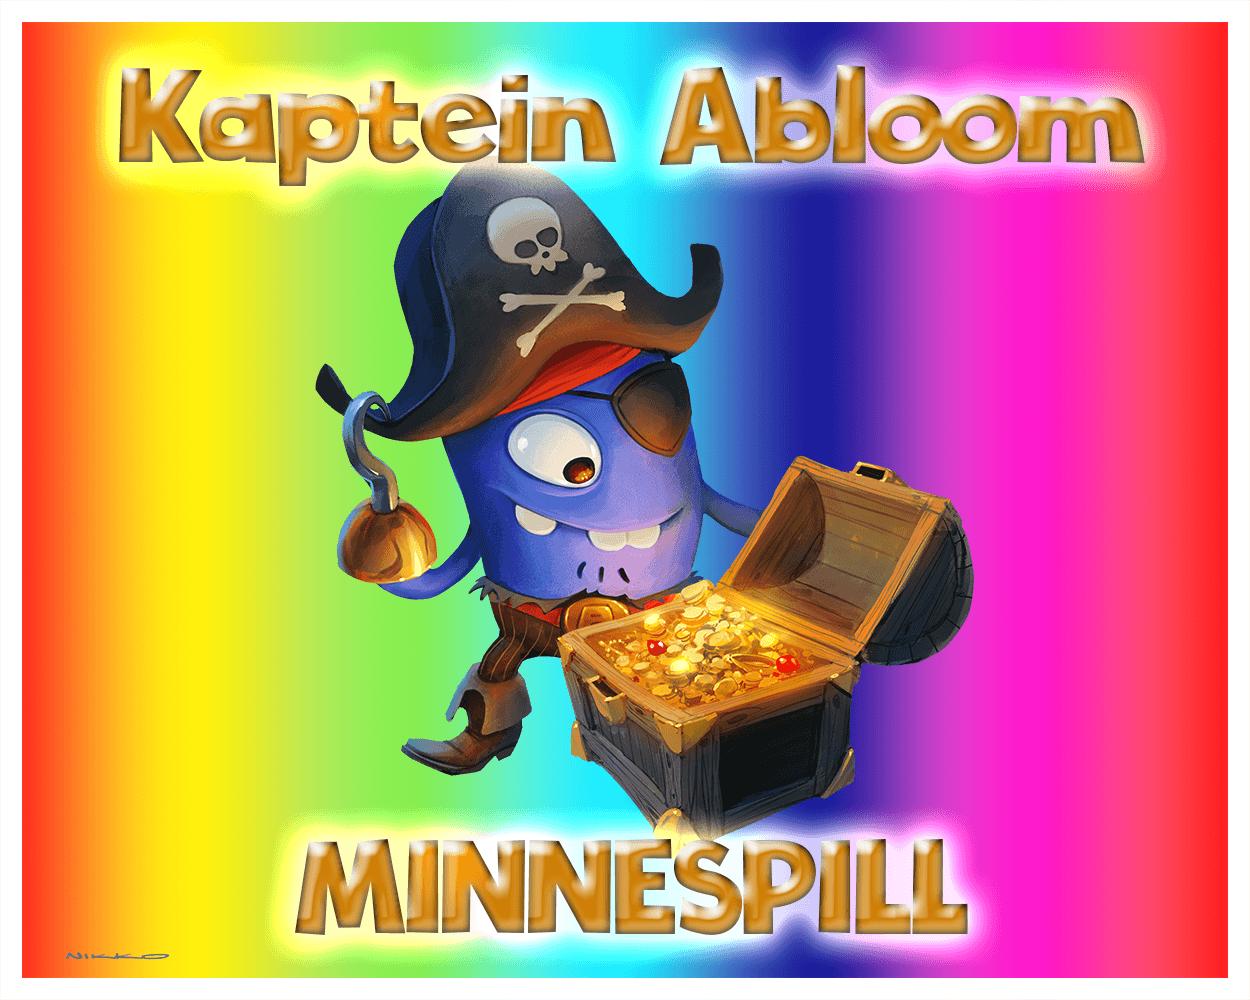 Kaptein Abloom Thumbnail v01.png